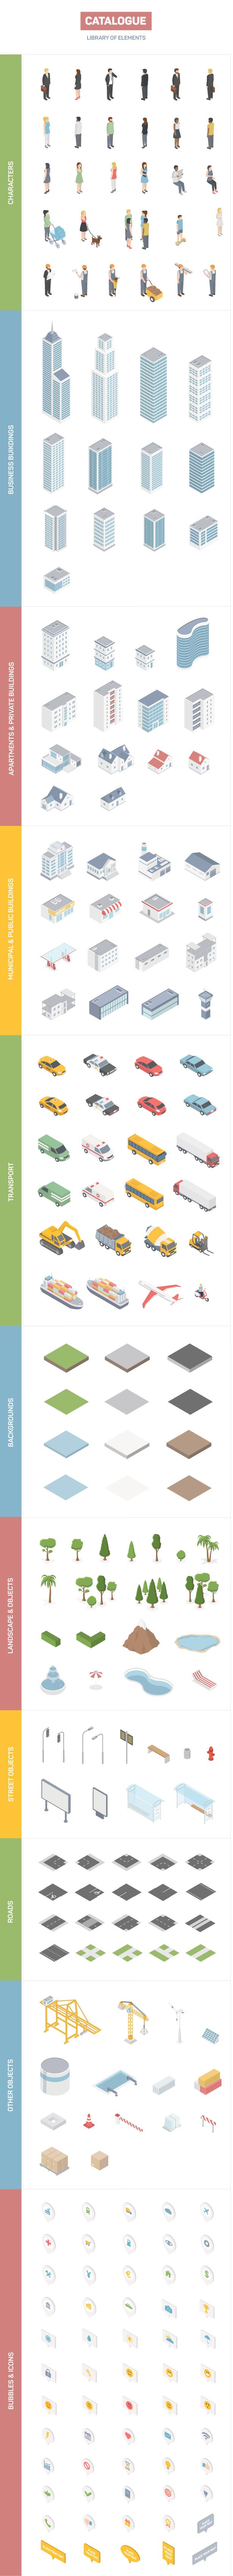 Isometric Map Builder - 6